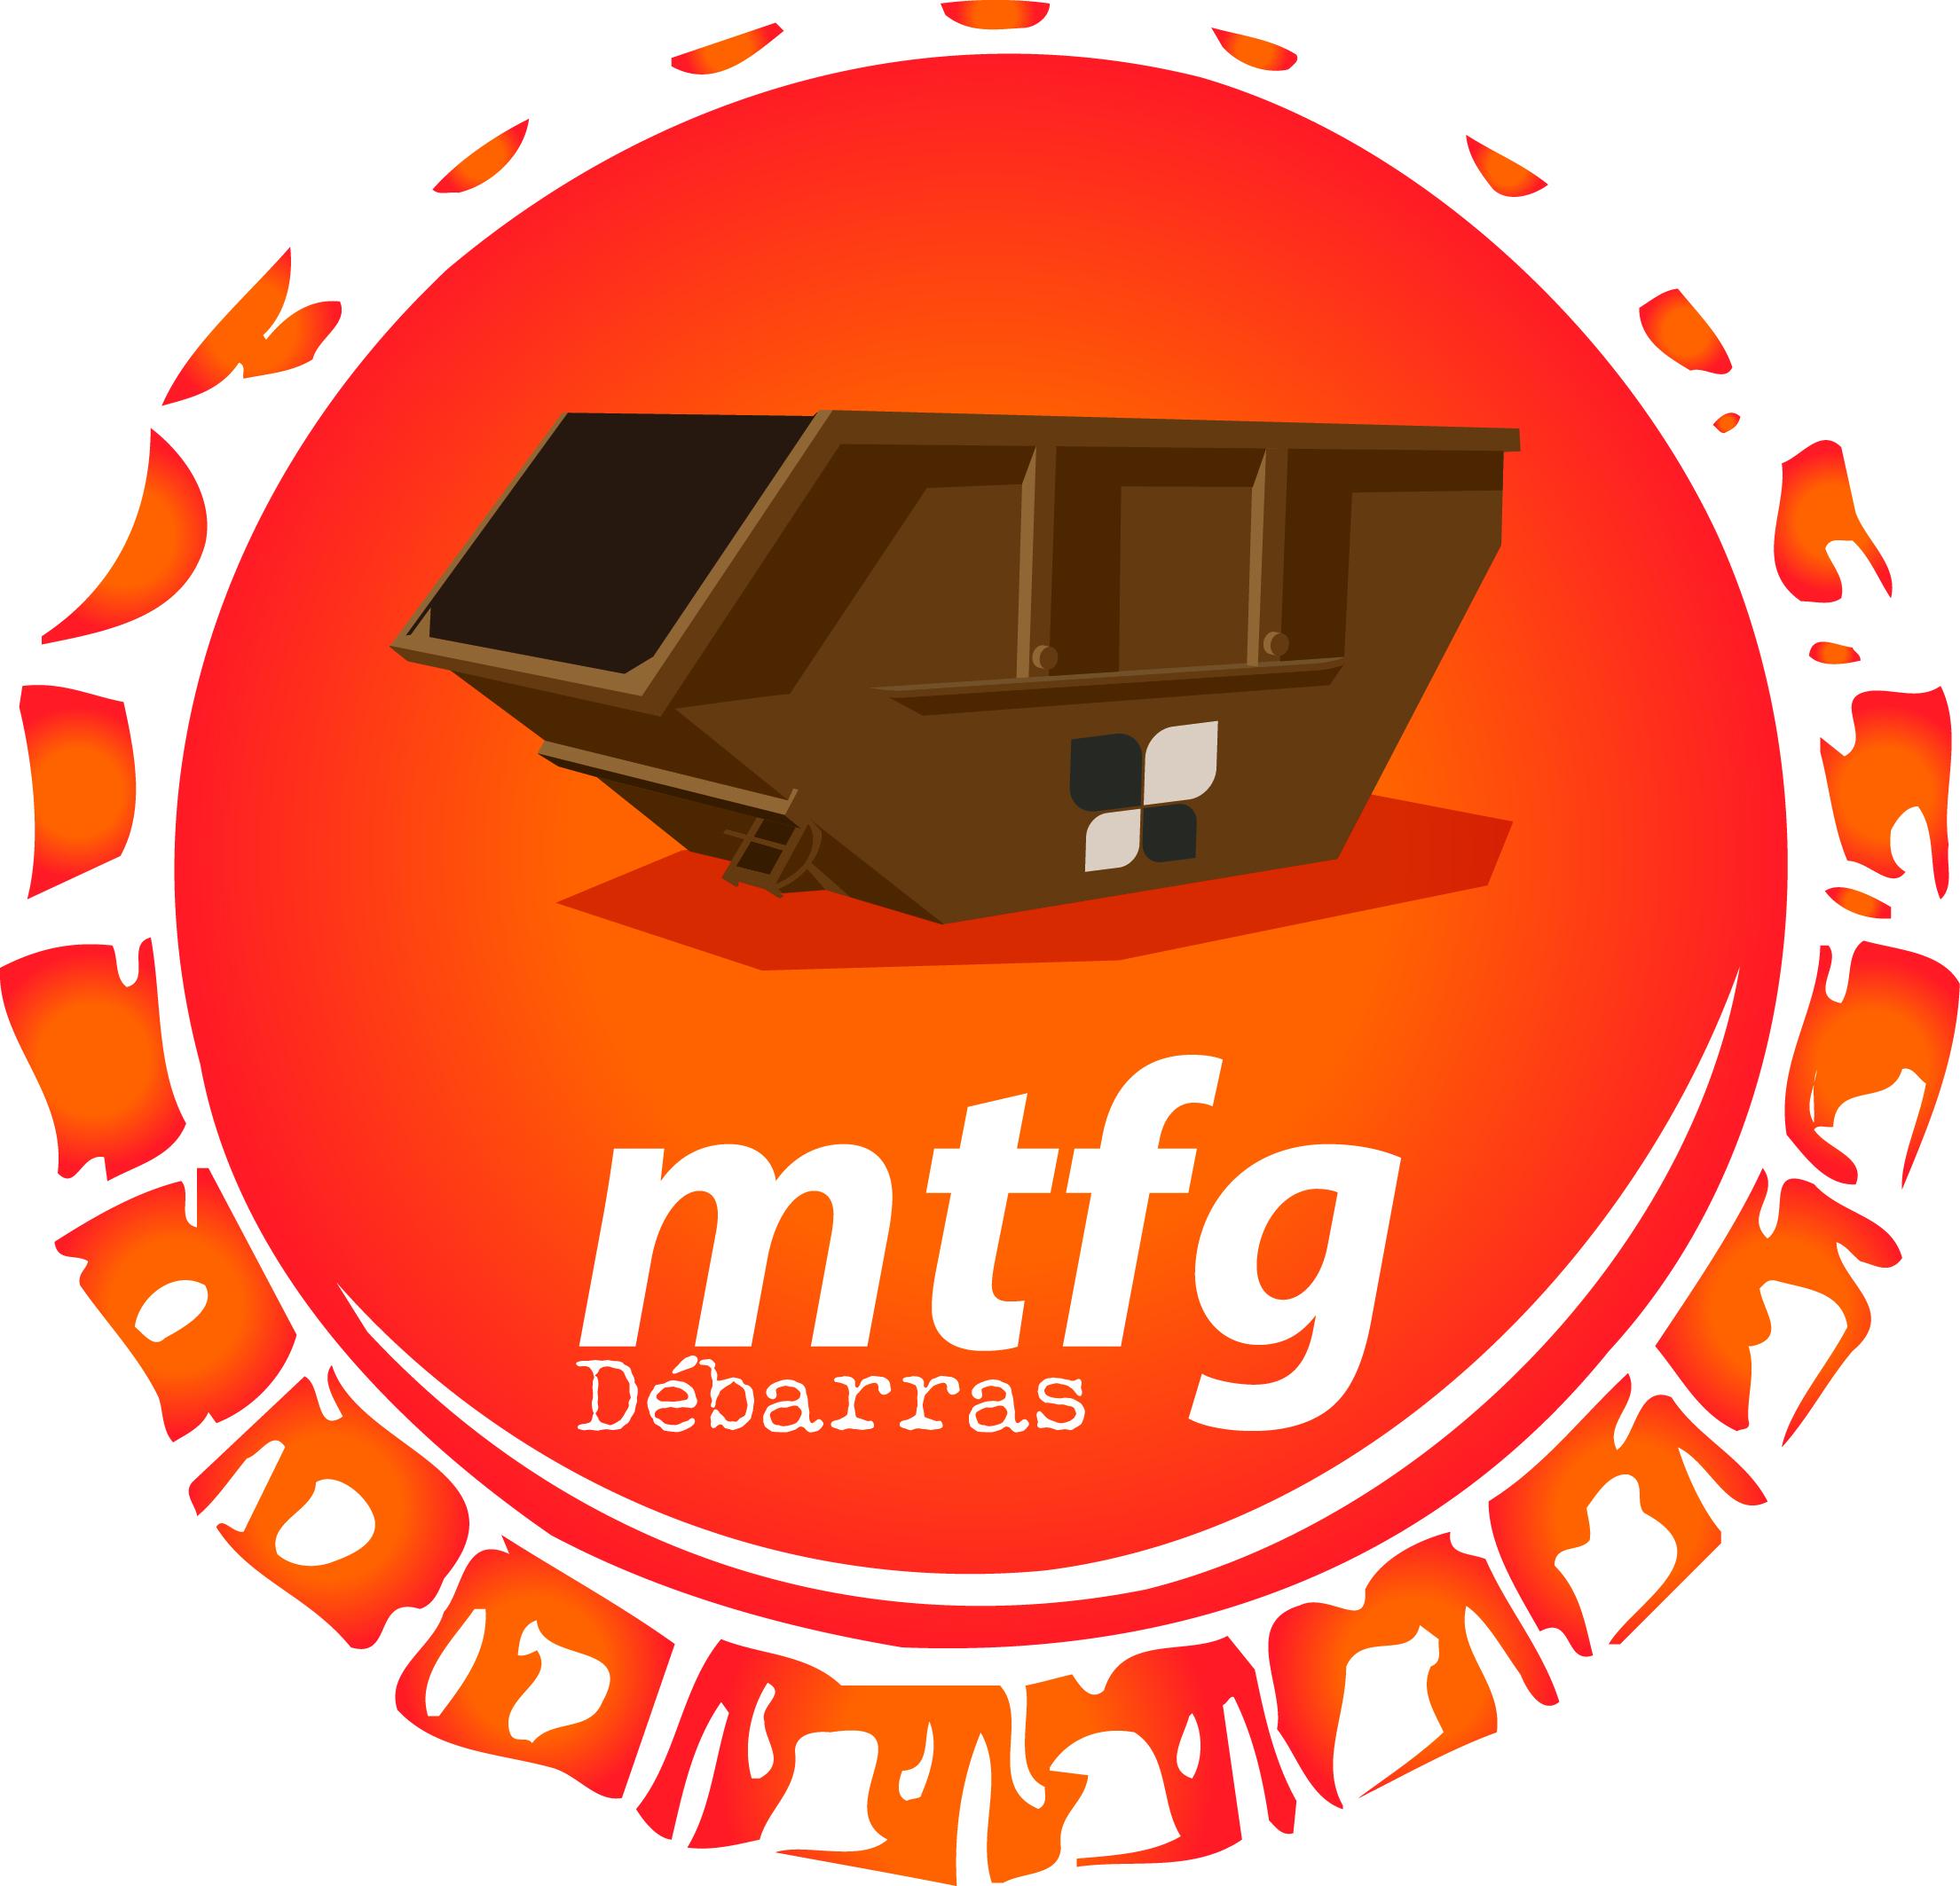 MTFG Débarras